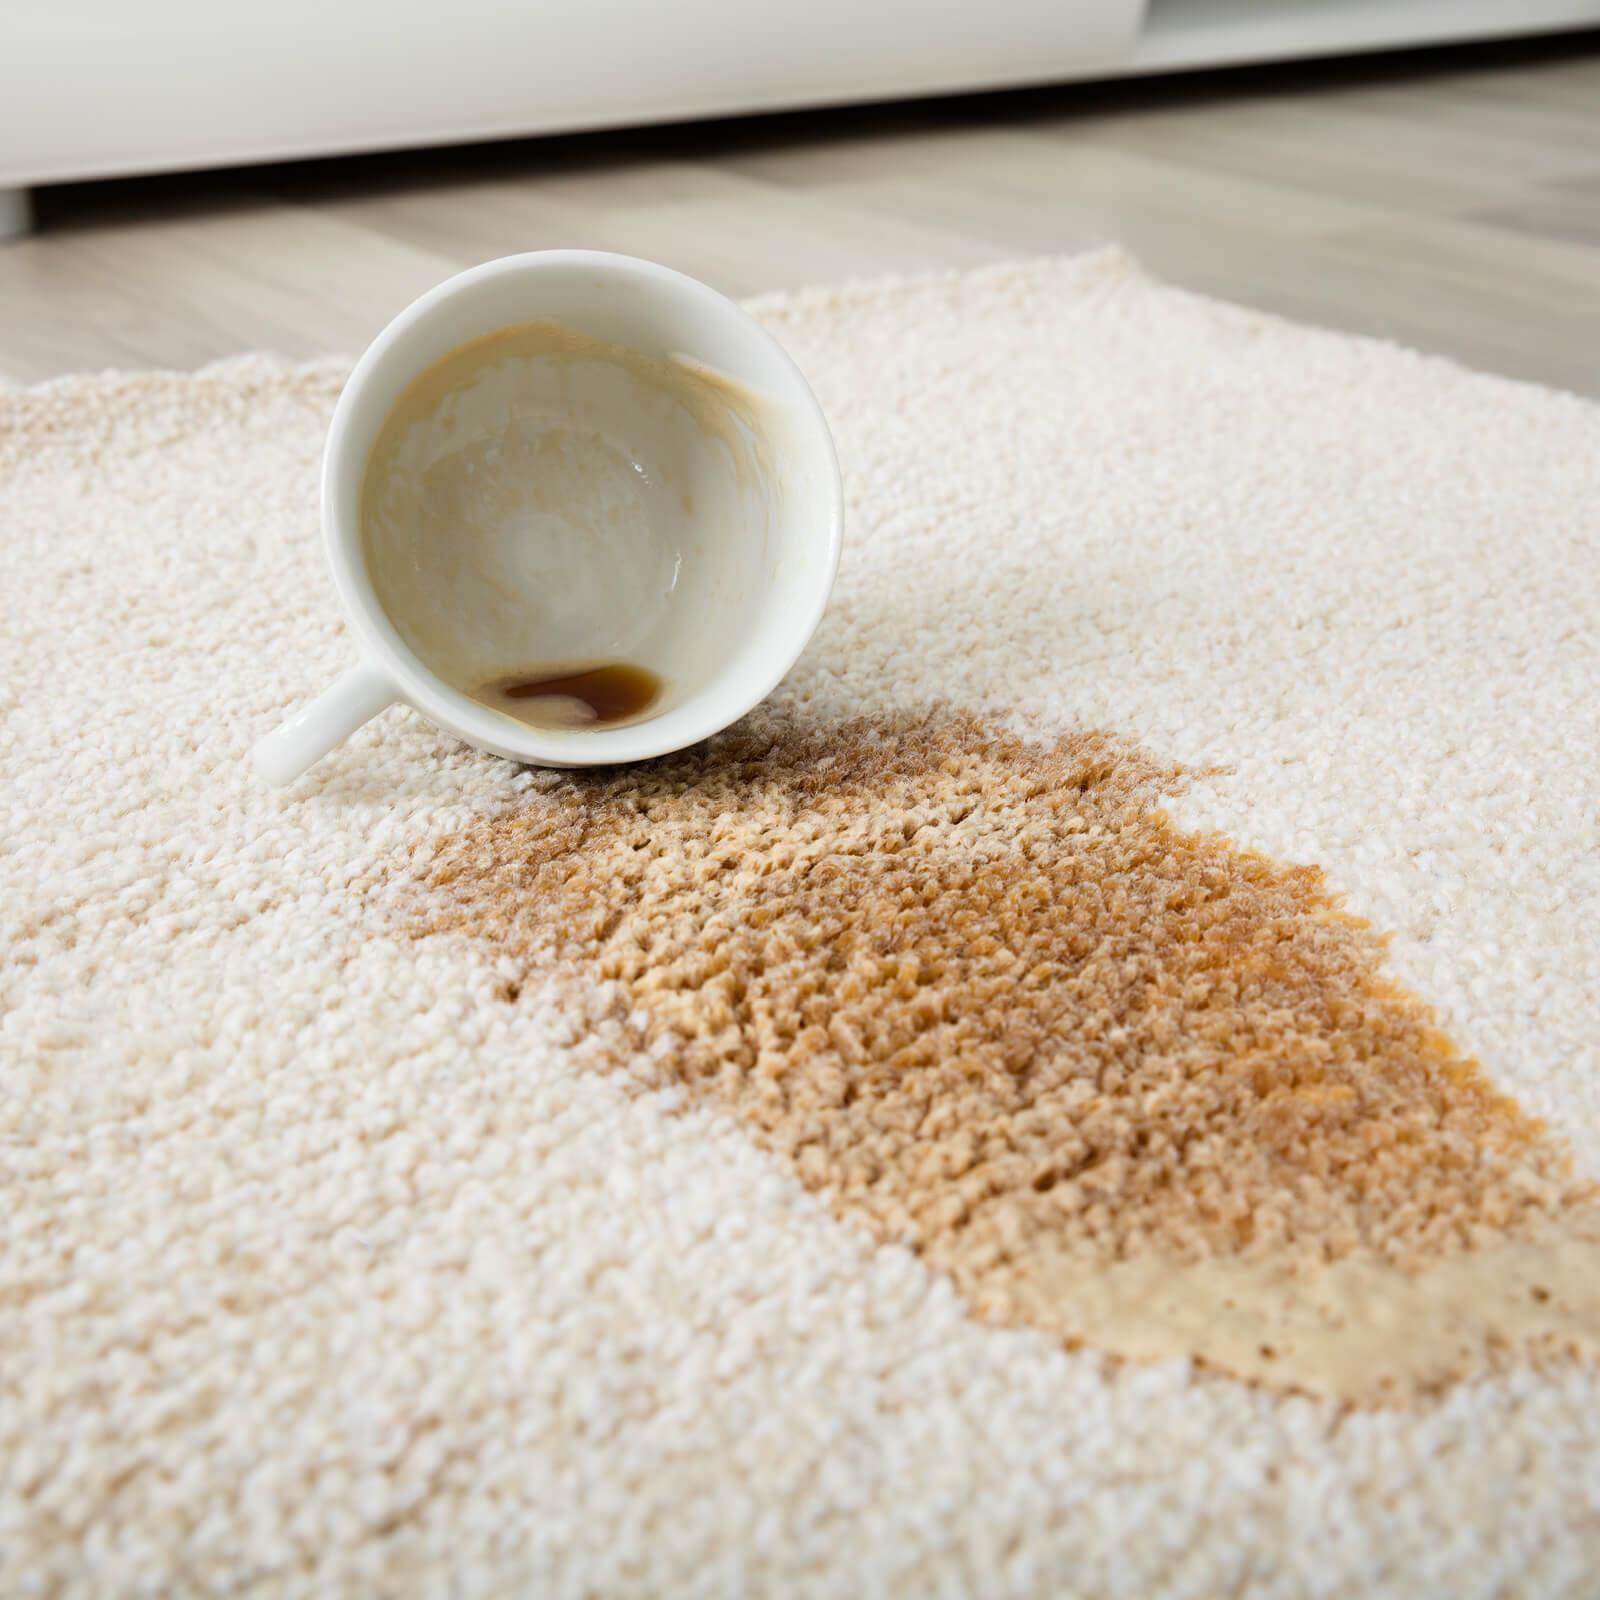 Coffee spill on area rug | Brooks Flooring Services Inc